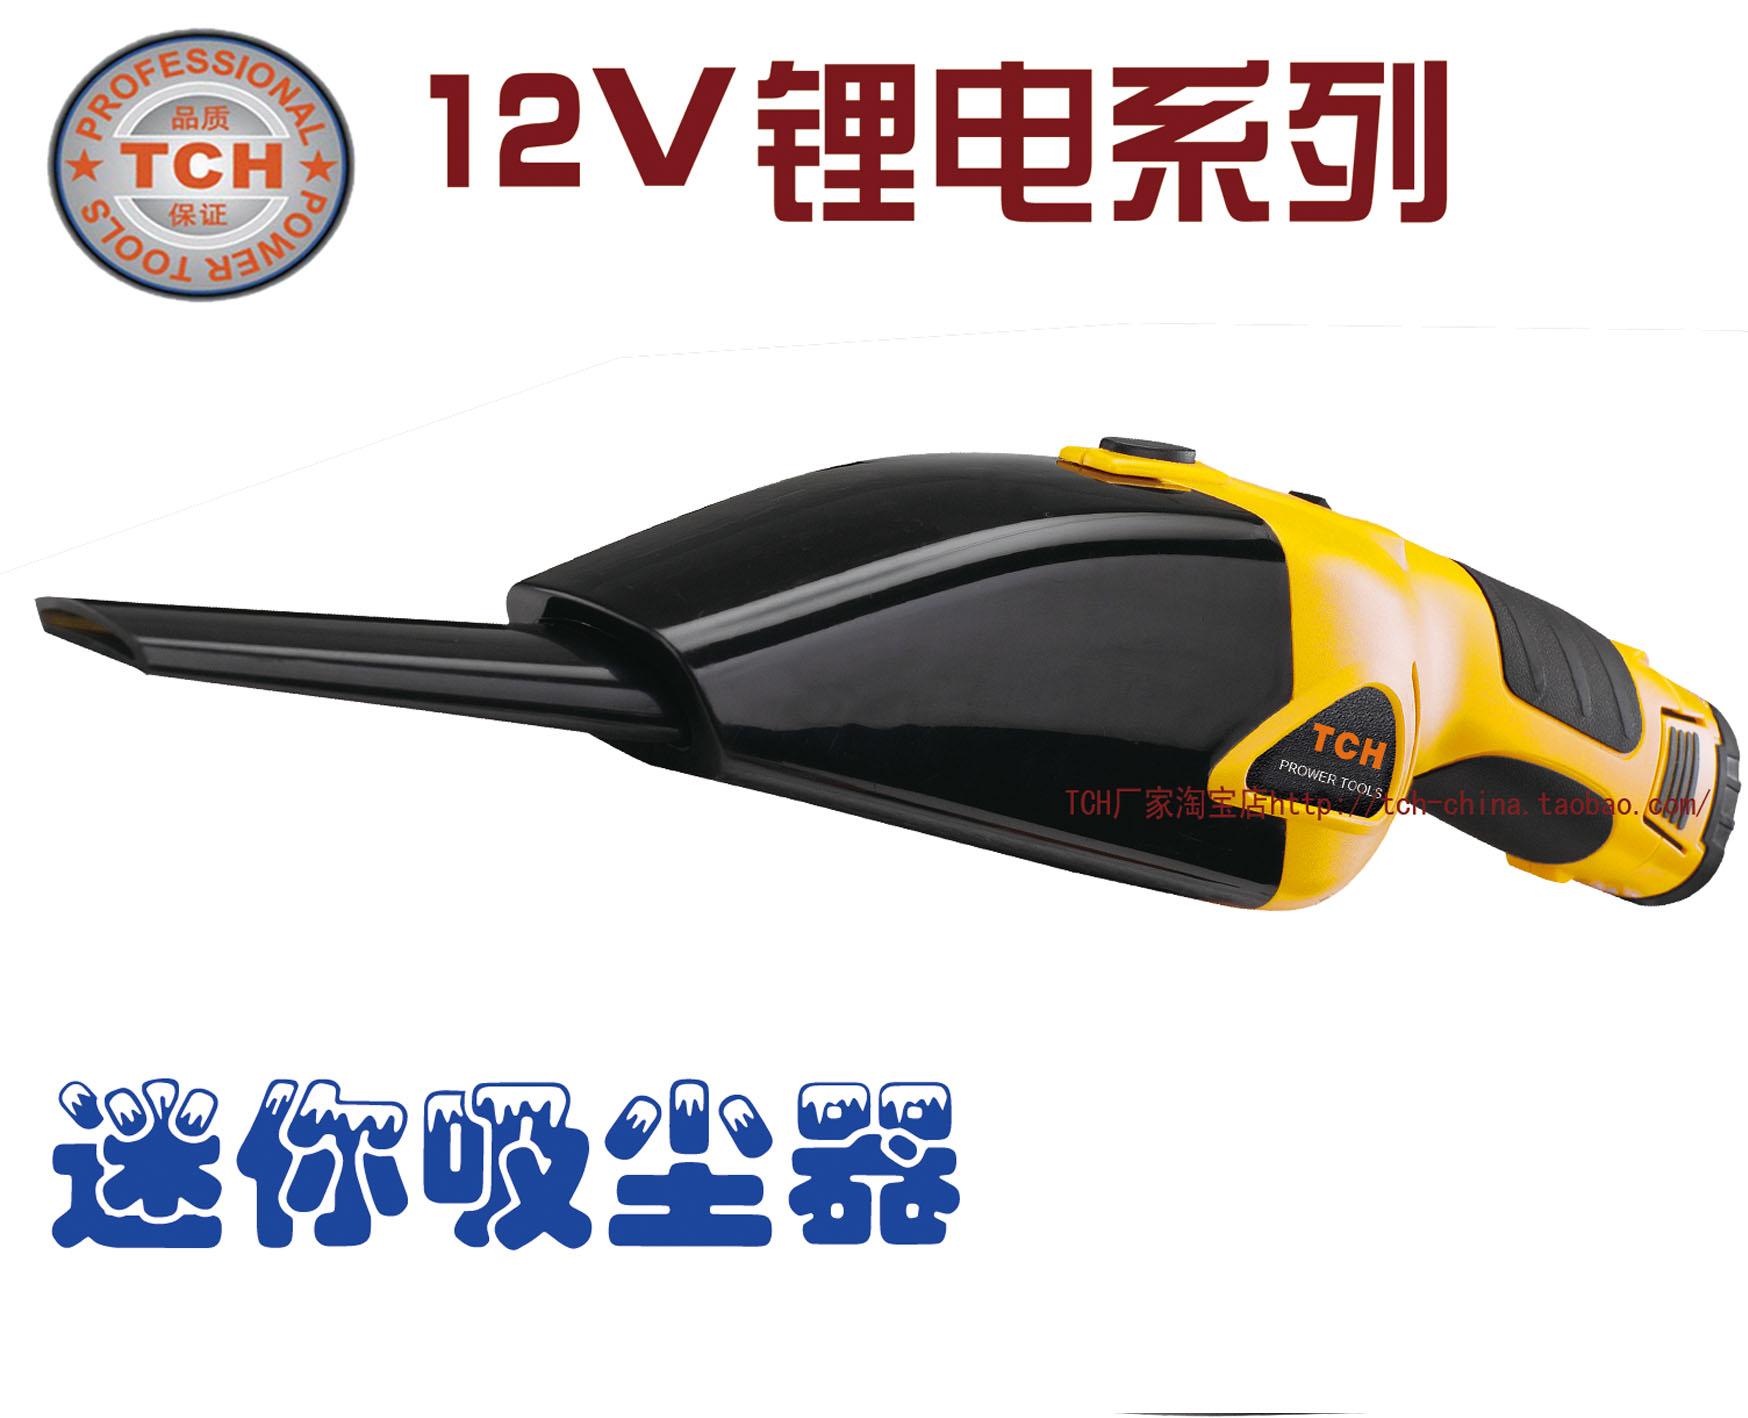 12v lithium battery vacuum cleaner mini vacuum cleaner handheld cordless charge type sofa car vacuum cleaner(China (Mainland))